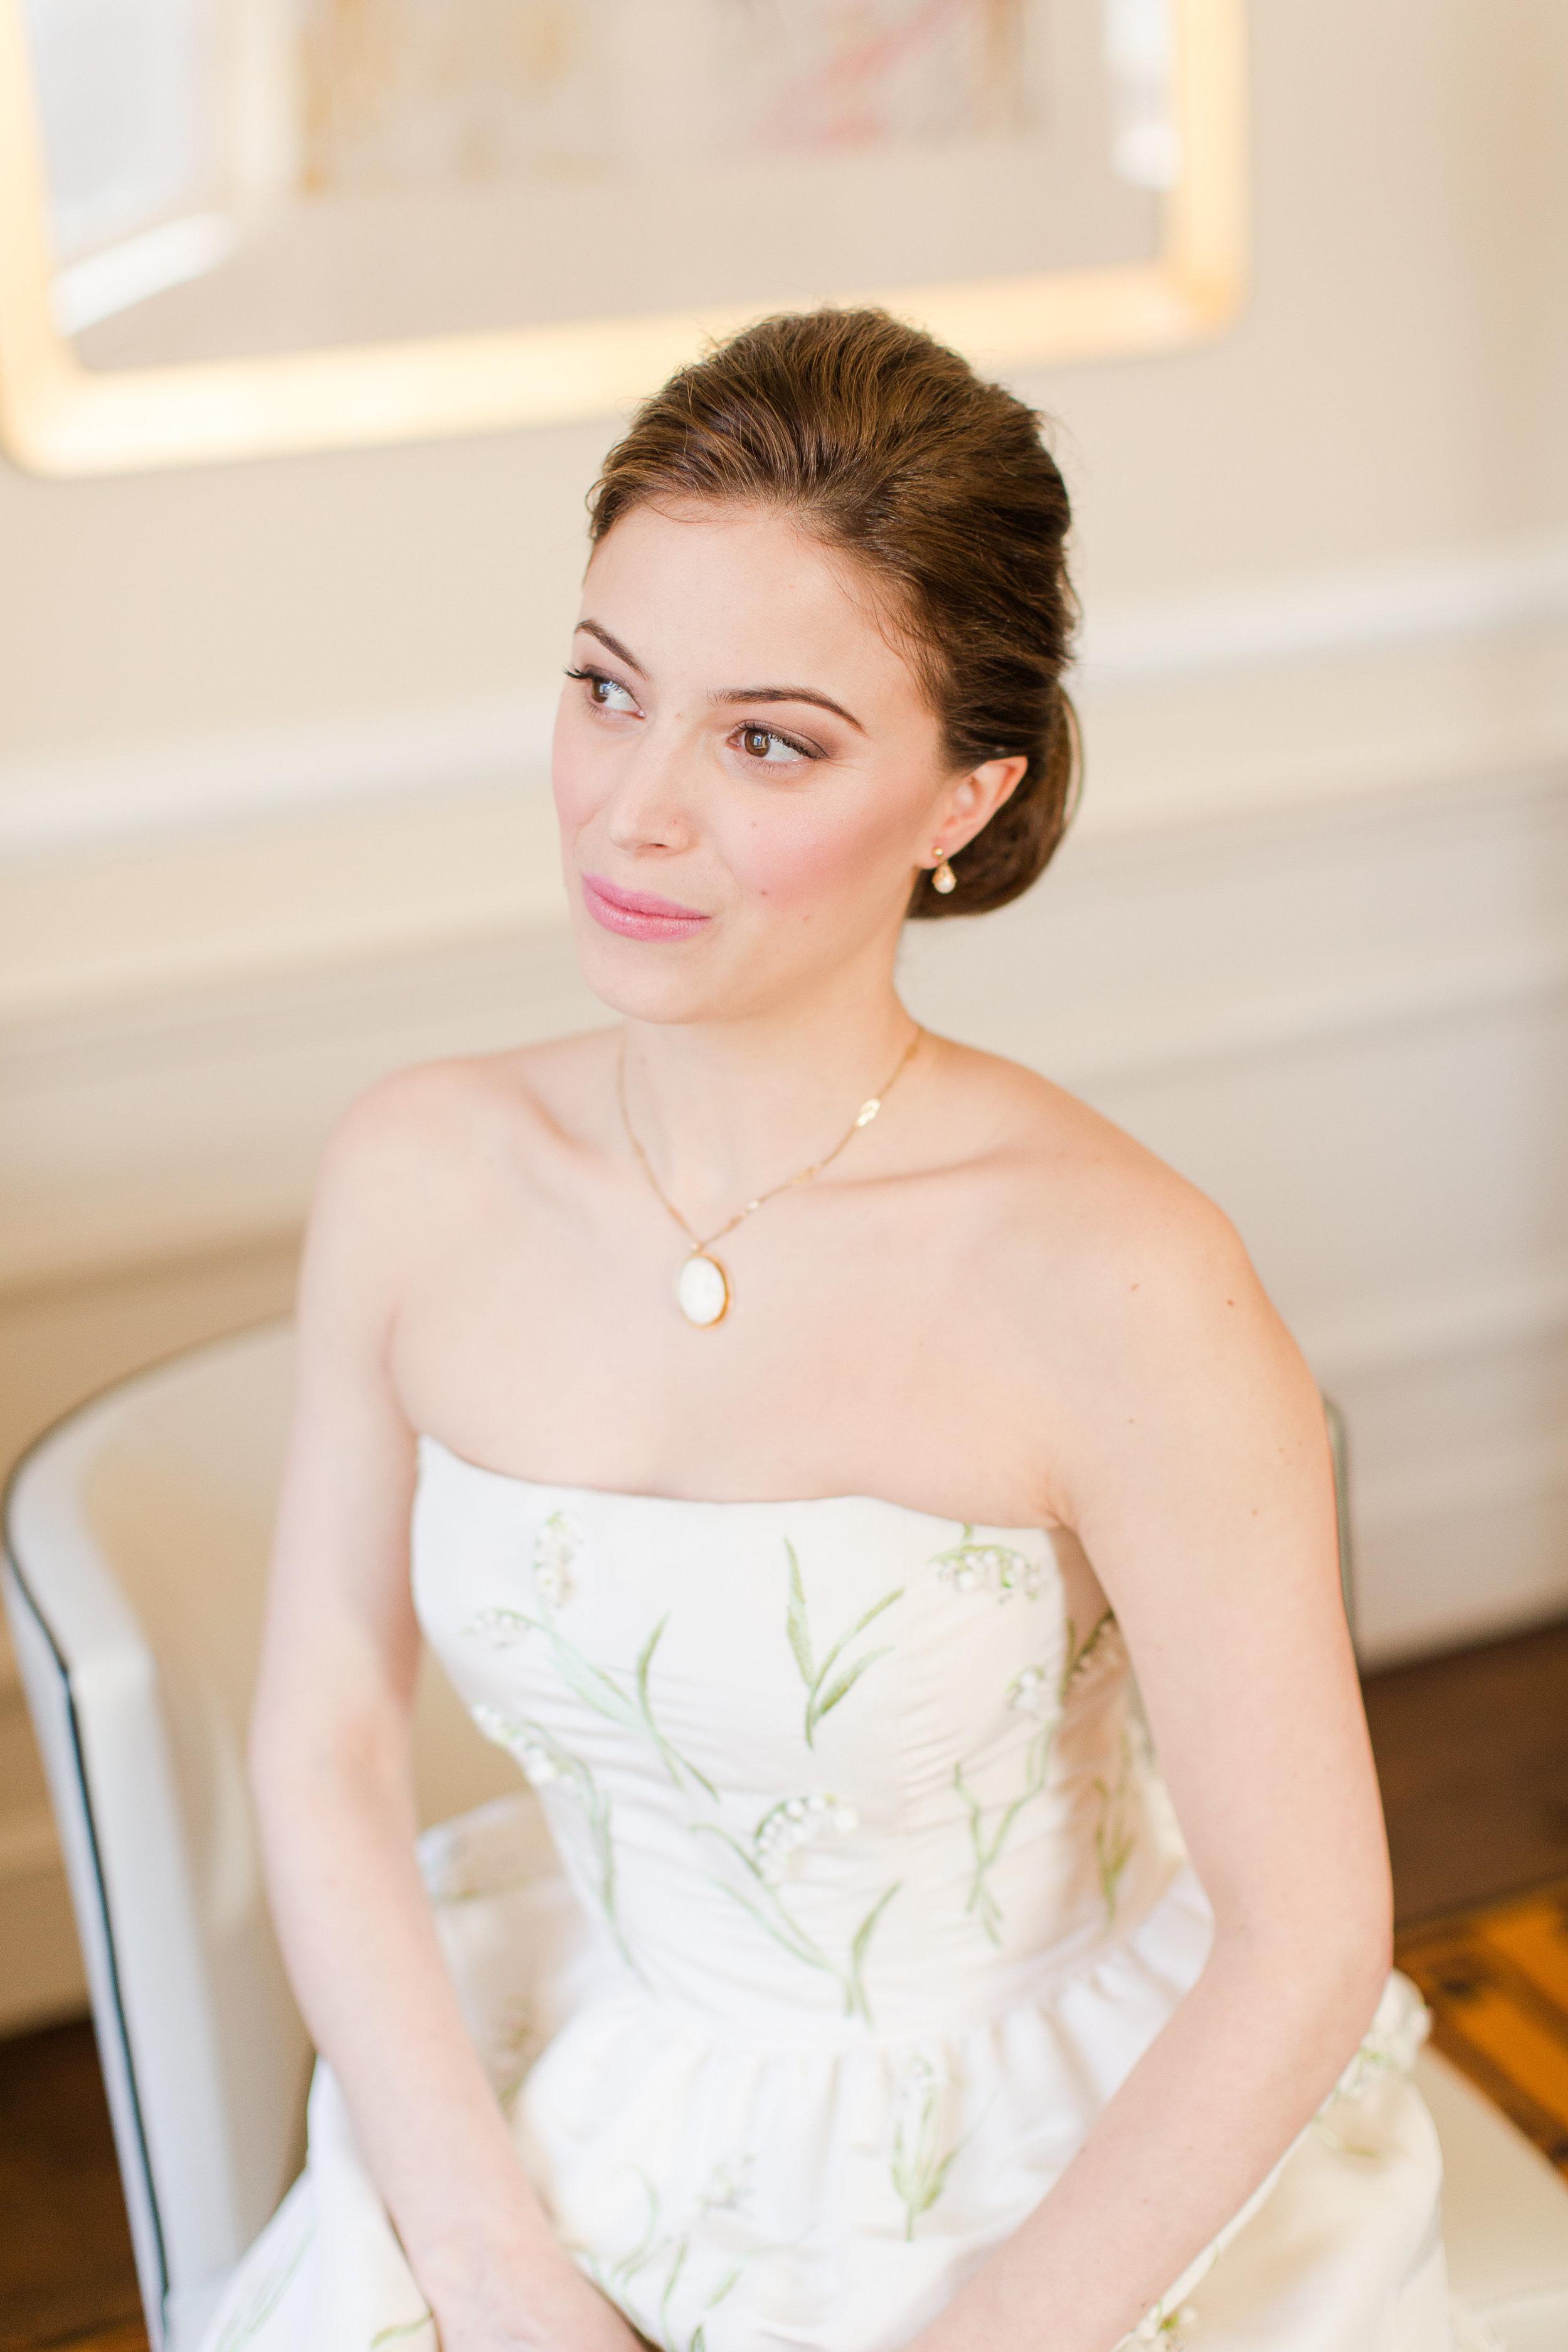 Crenshaw-Dunne Wedding  New York, NY  Photographer - Jessica Haley